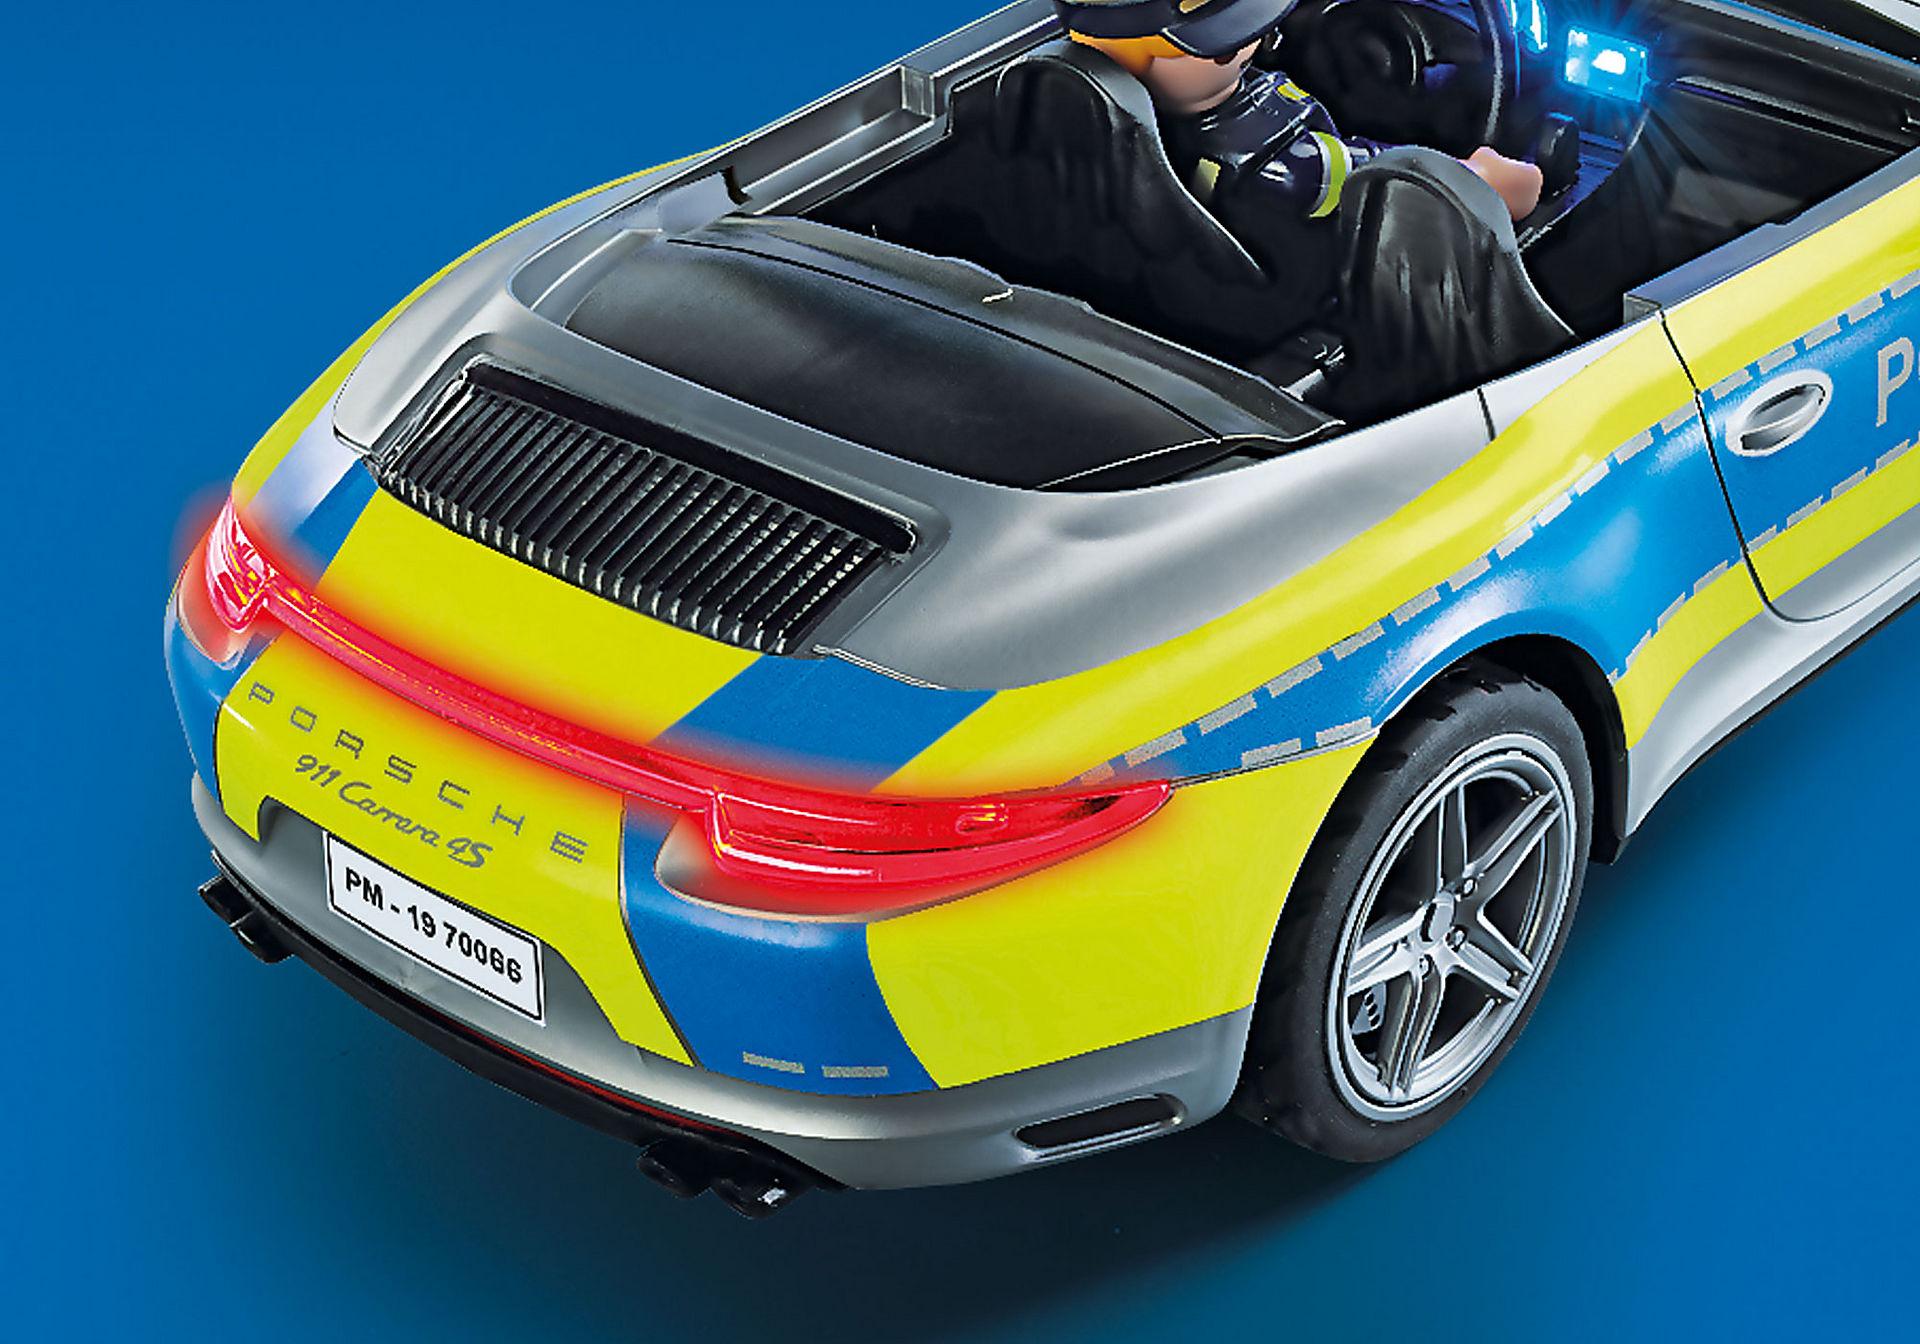 70066 Porsche 911 Carrera 4S Police zoom image6